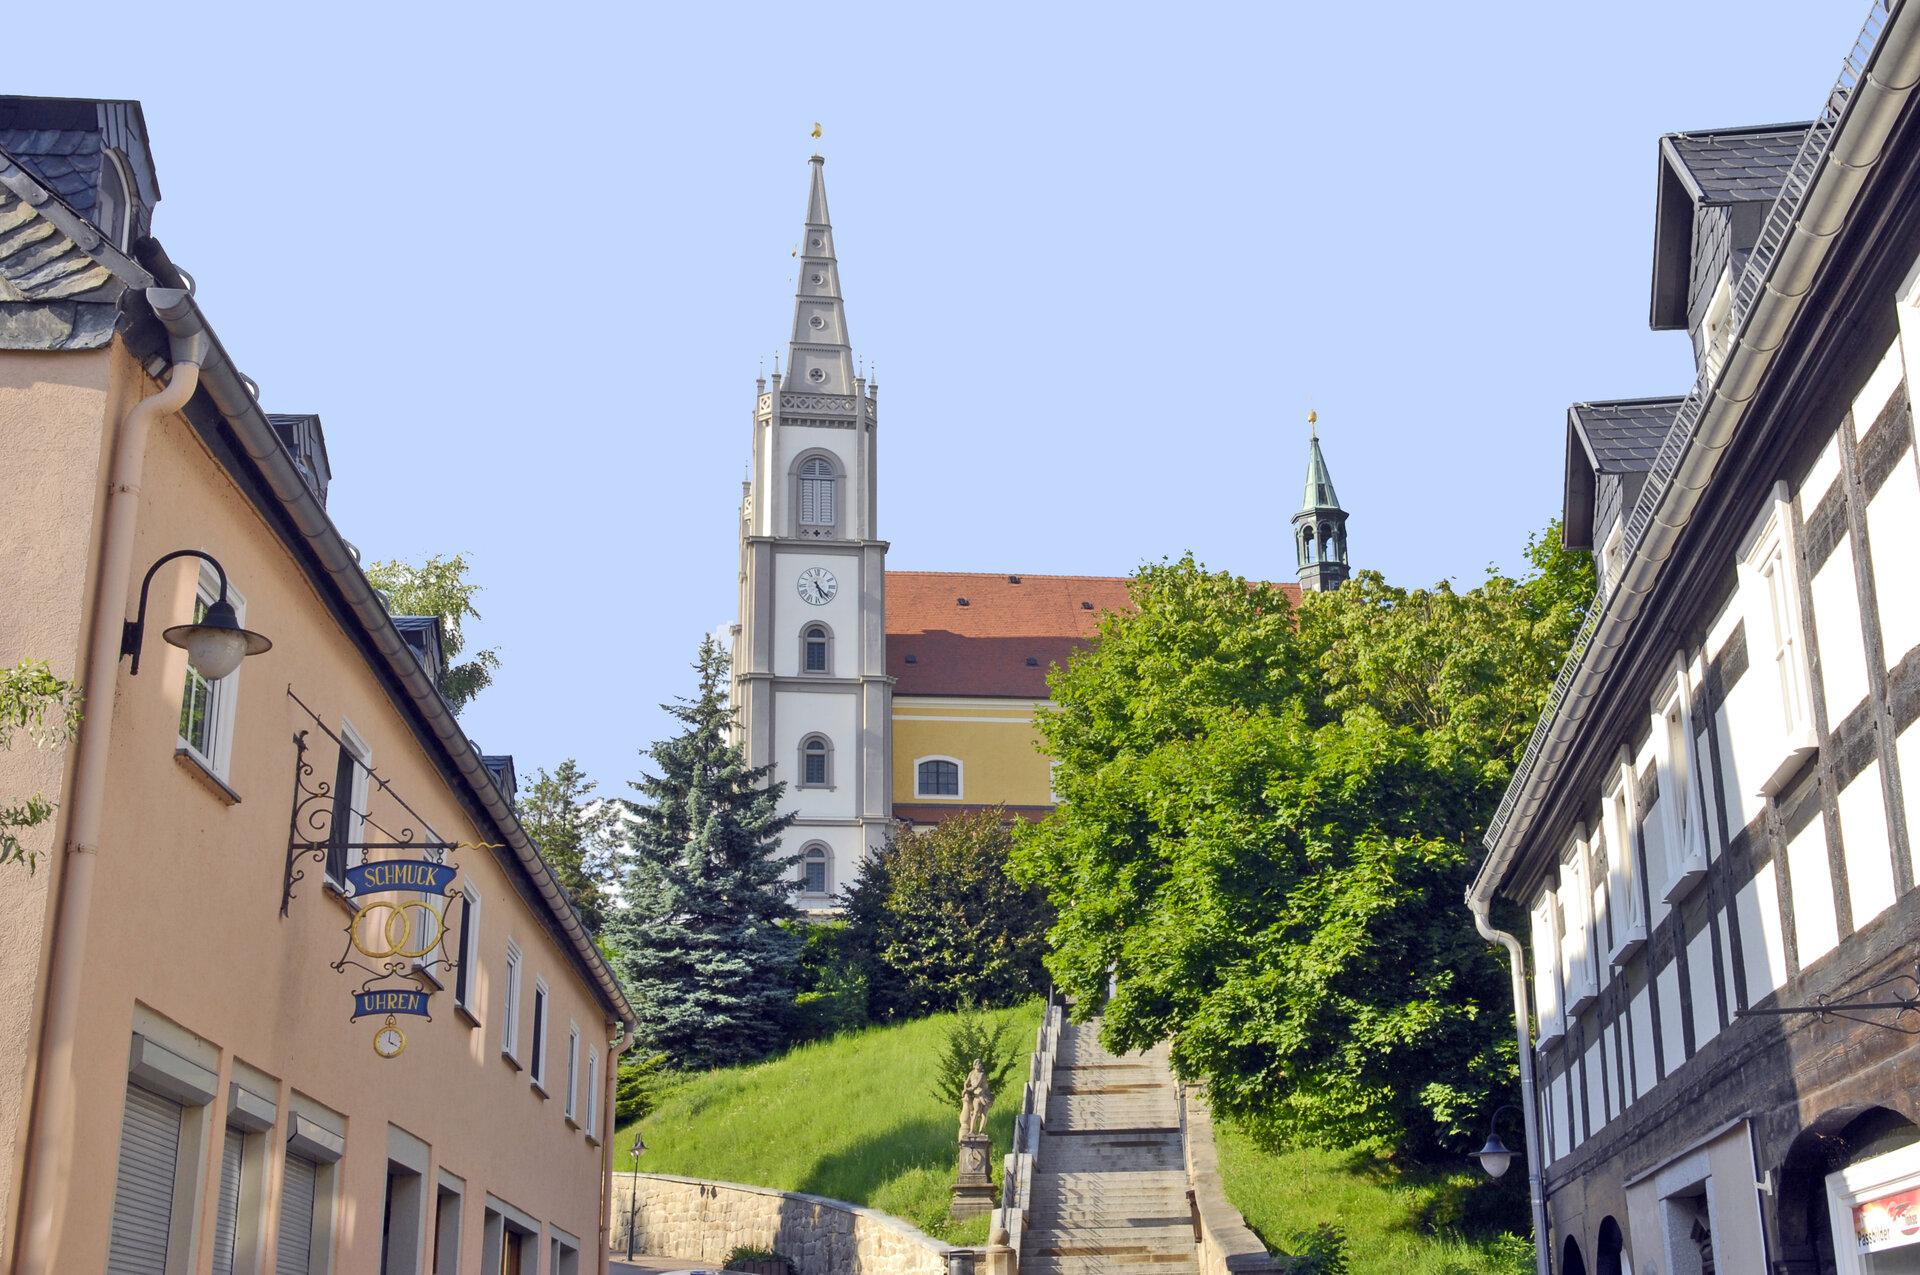 katholische Kirche Schirgiswalde